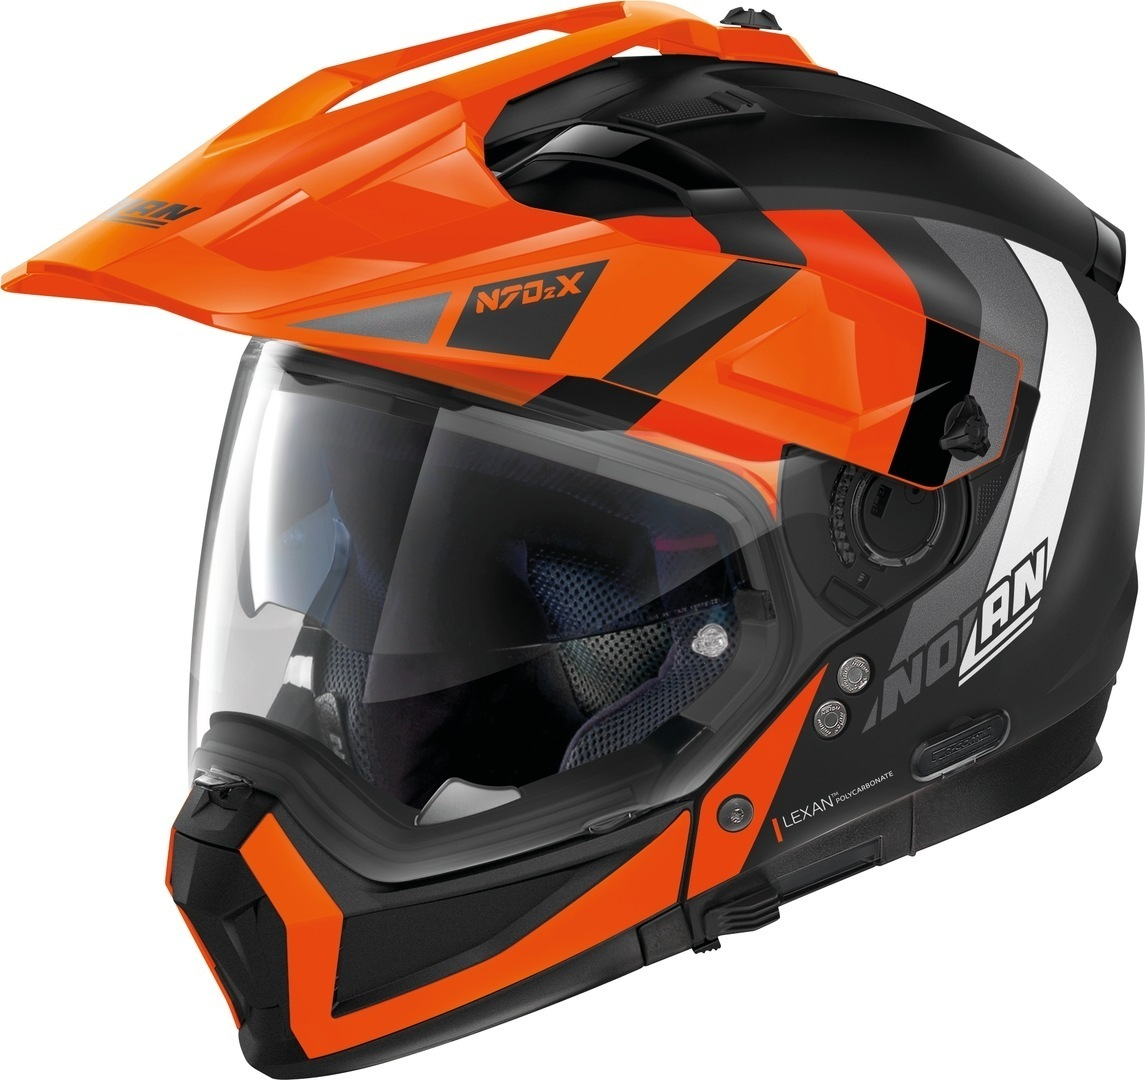 Nolan N70-2 X Decurio N-Com Helm, schwarz-orange, Größe M, schwarz-orange, Größe M